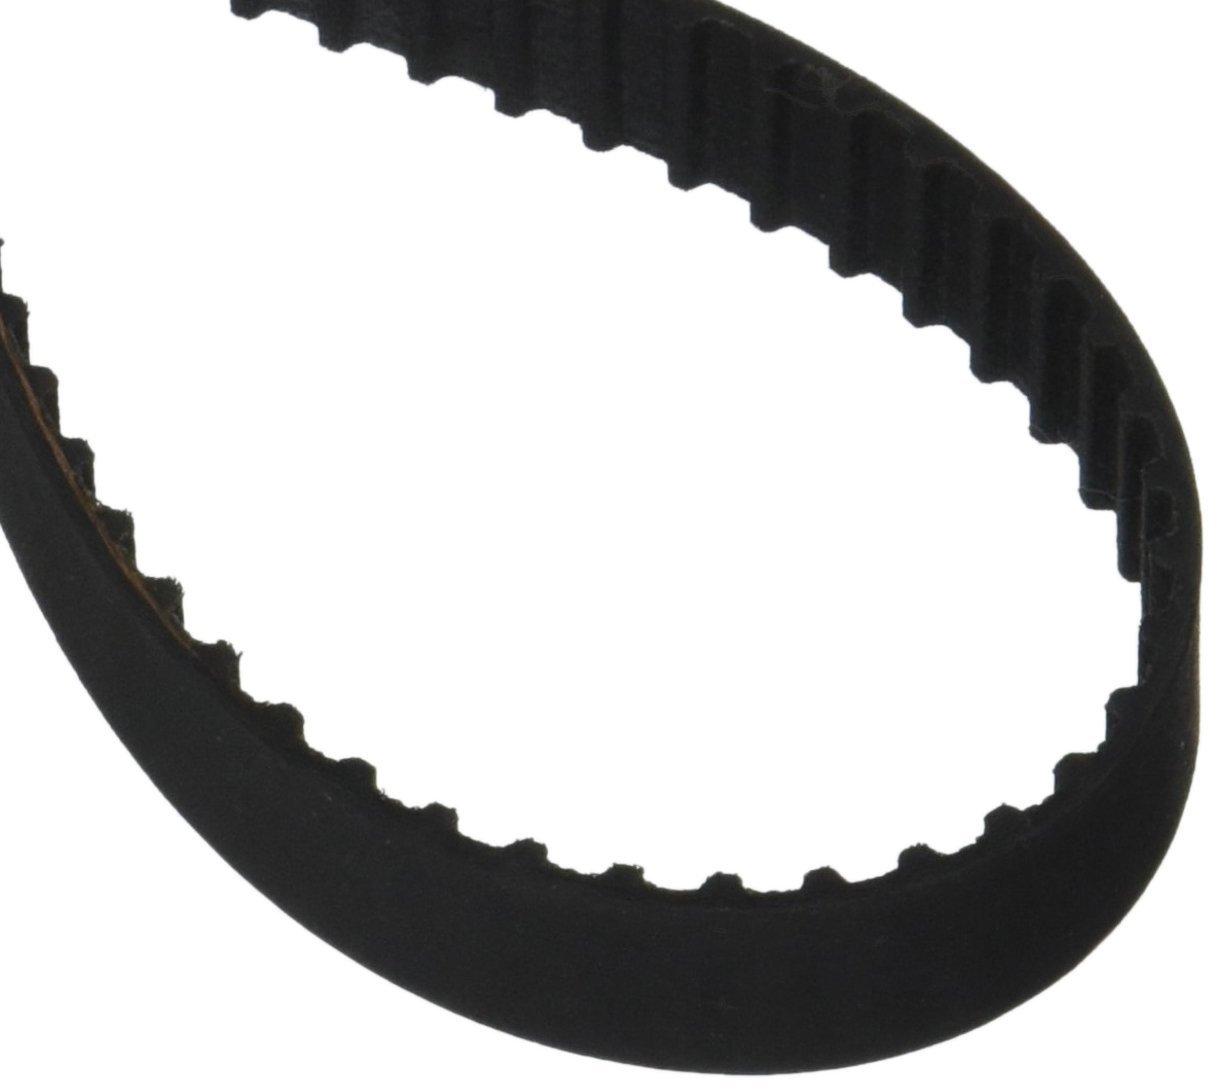 Jason Industrial 150XL051 Pitch Standard Timing Belt, 0.51' Width, 1/5' XL Pitch, 15' Pitch Length, 75 Teeth 0.51 Width 1/5 XL Pitch 15 Pitch Length